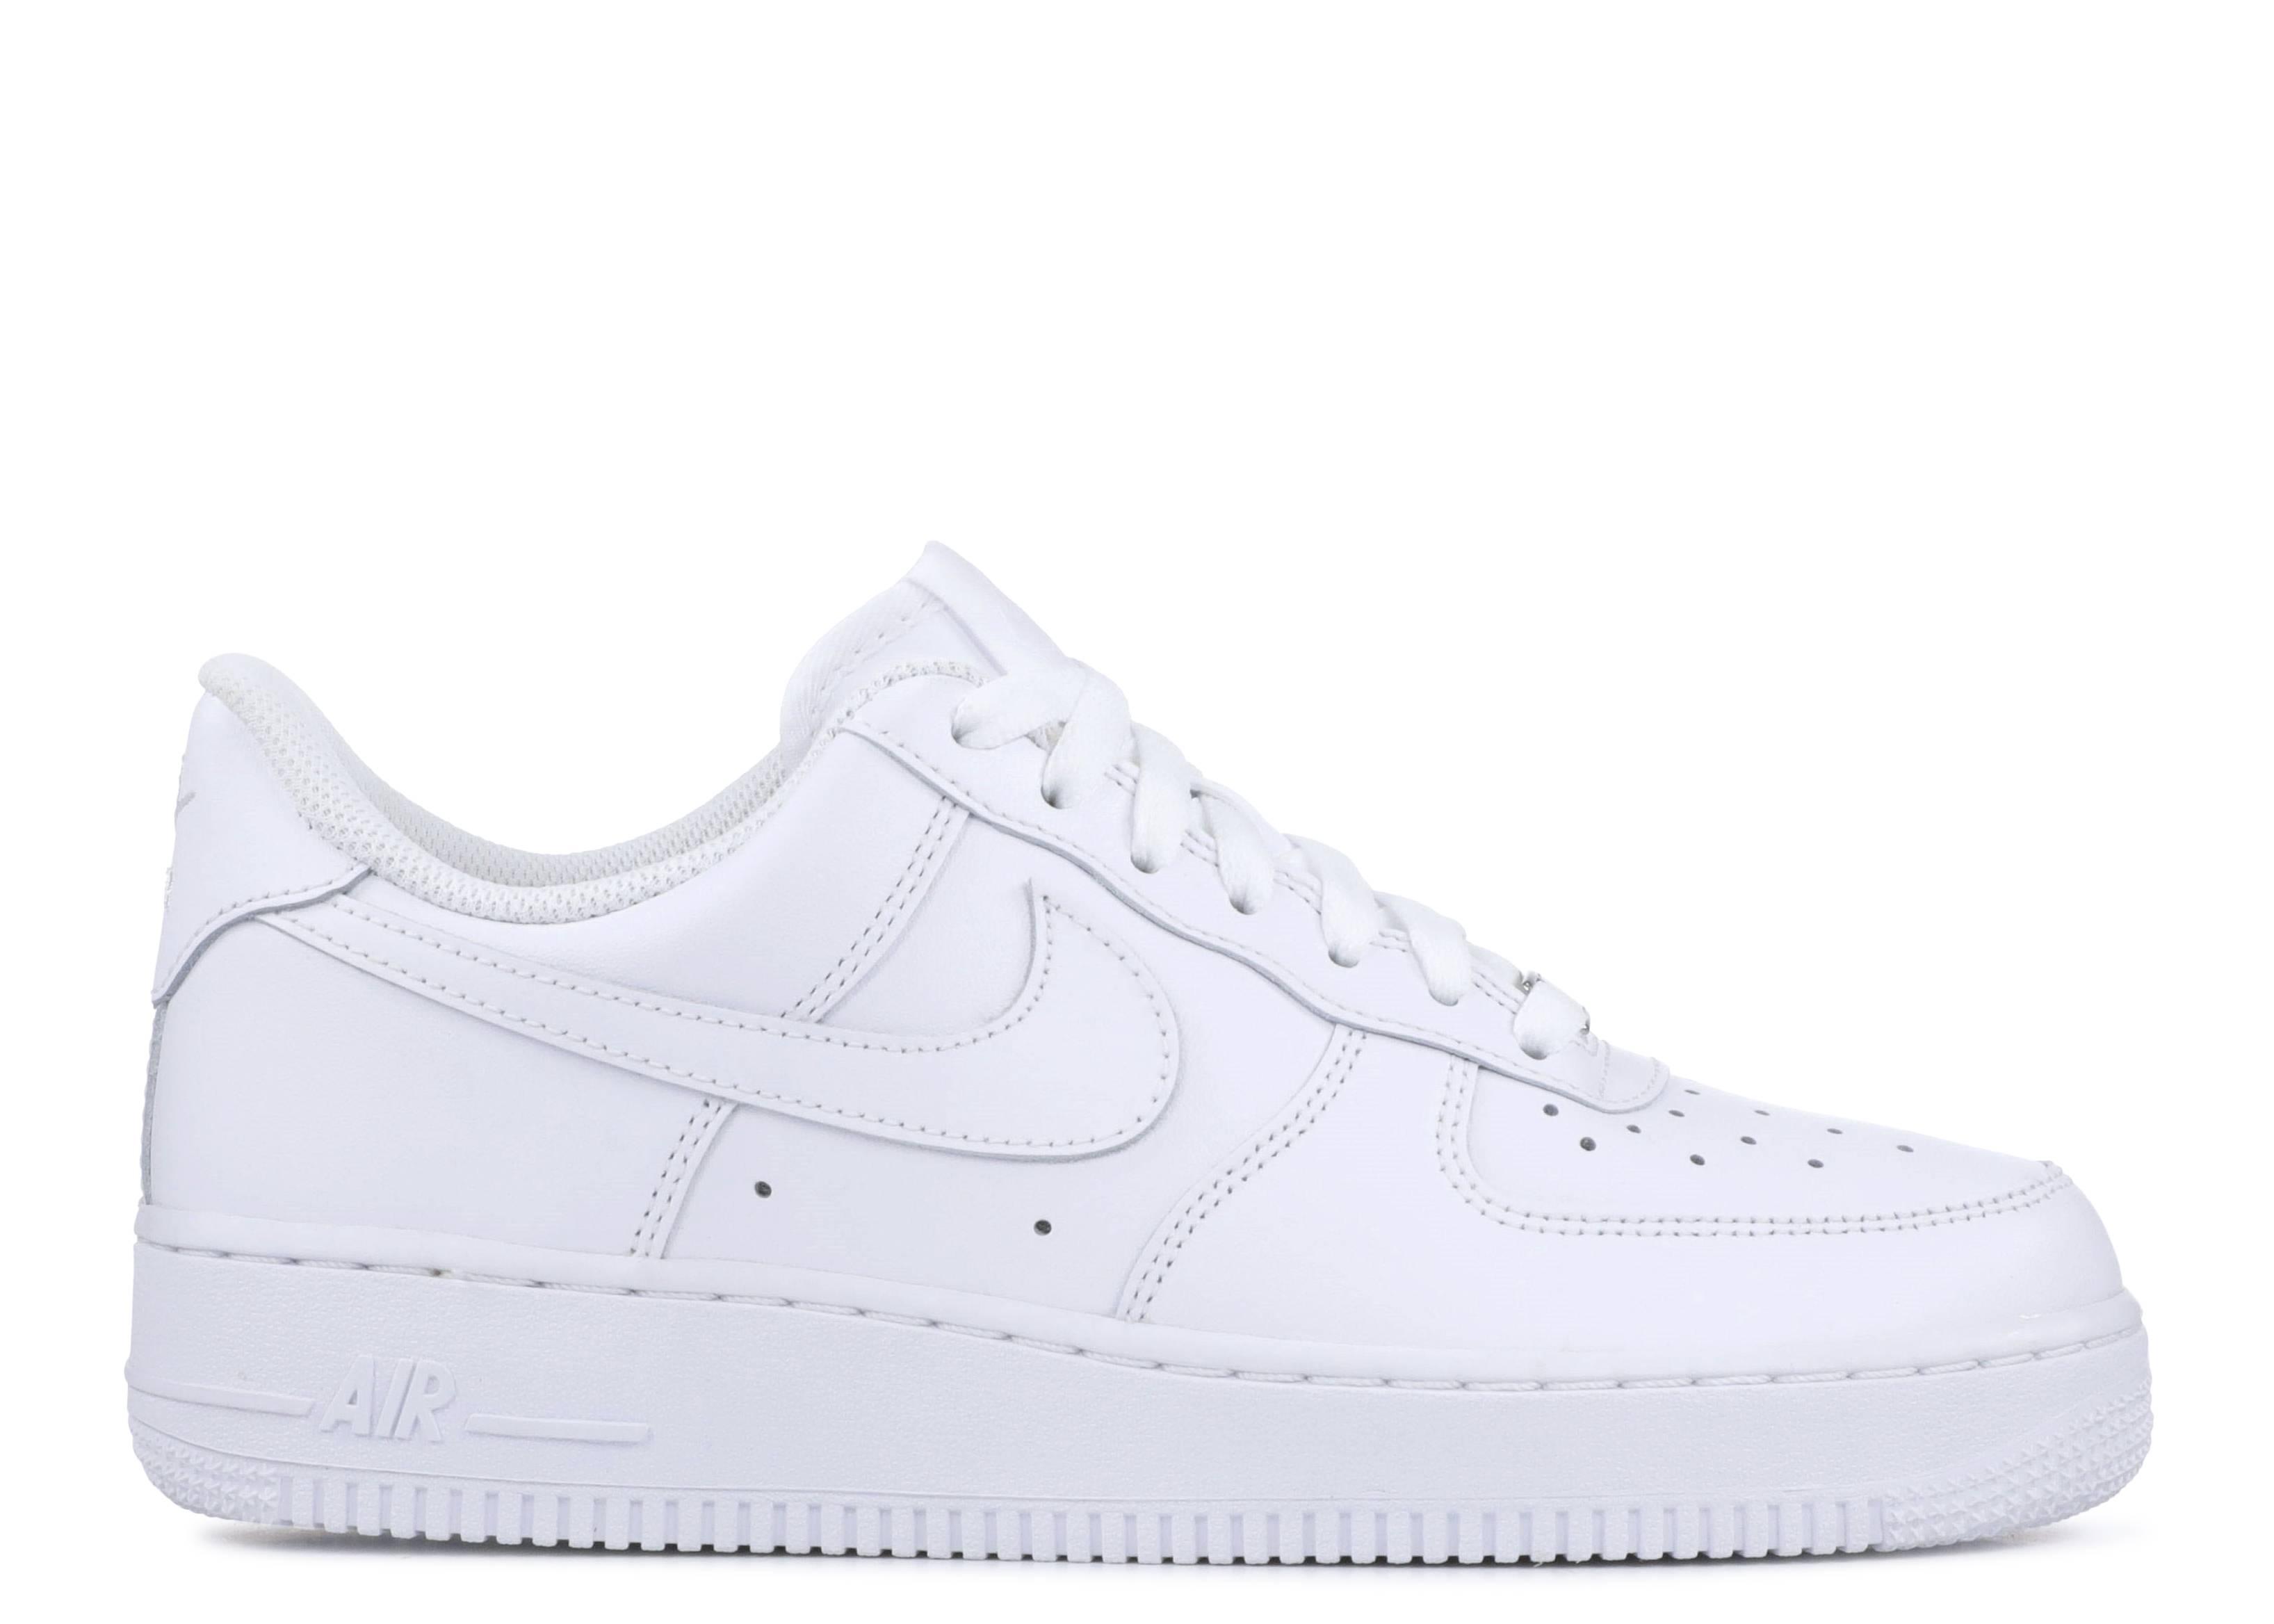 393c2c3698bc Wmns Air Force 1 07 - Nike - 315115 112 - white white